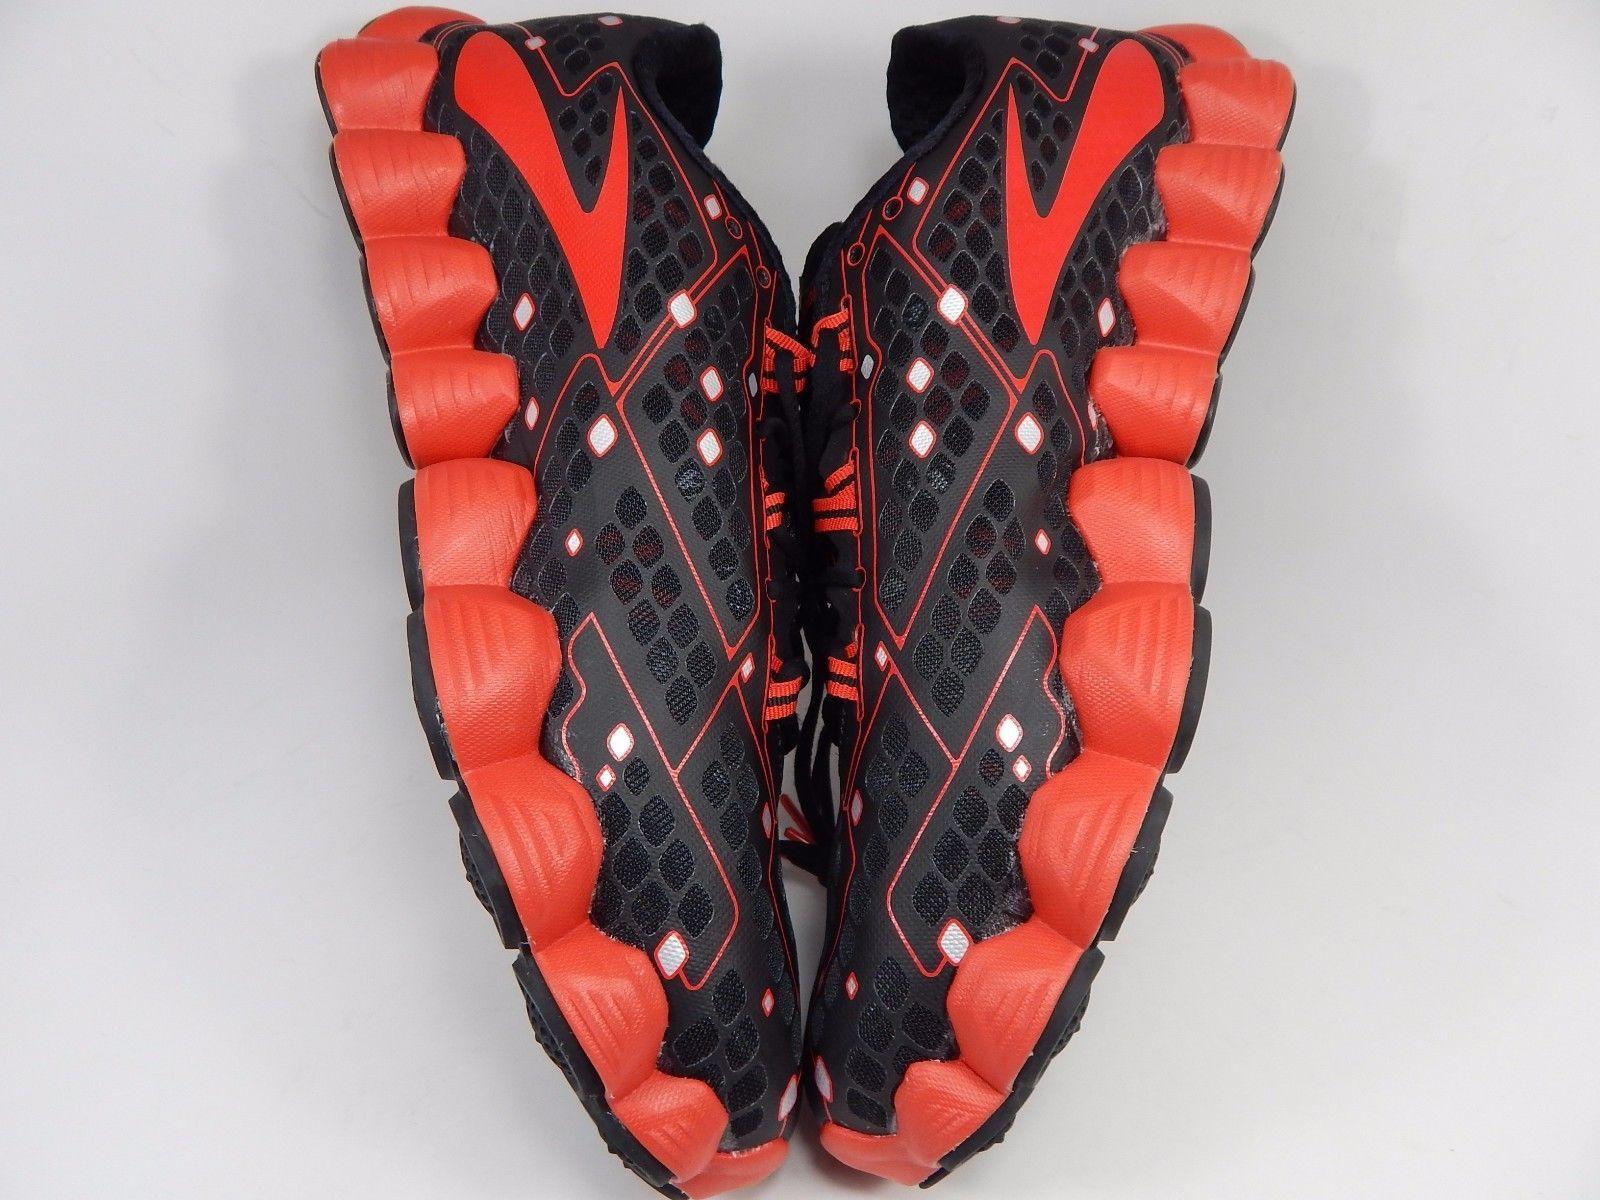 Brooks Neuro Men's Running Shoes Size US 11.5 M (D) EU 45.5 Black 1102111D073